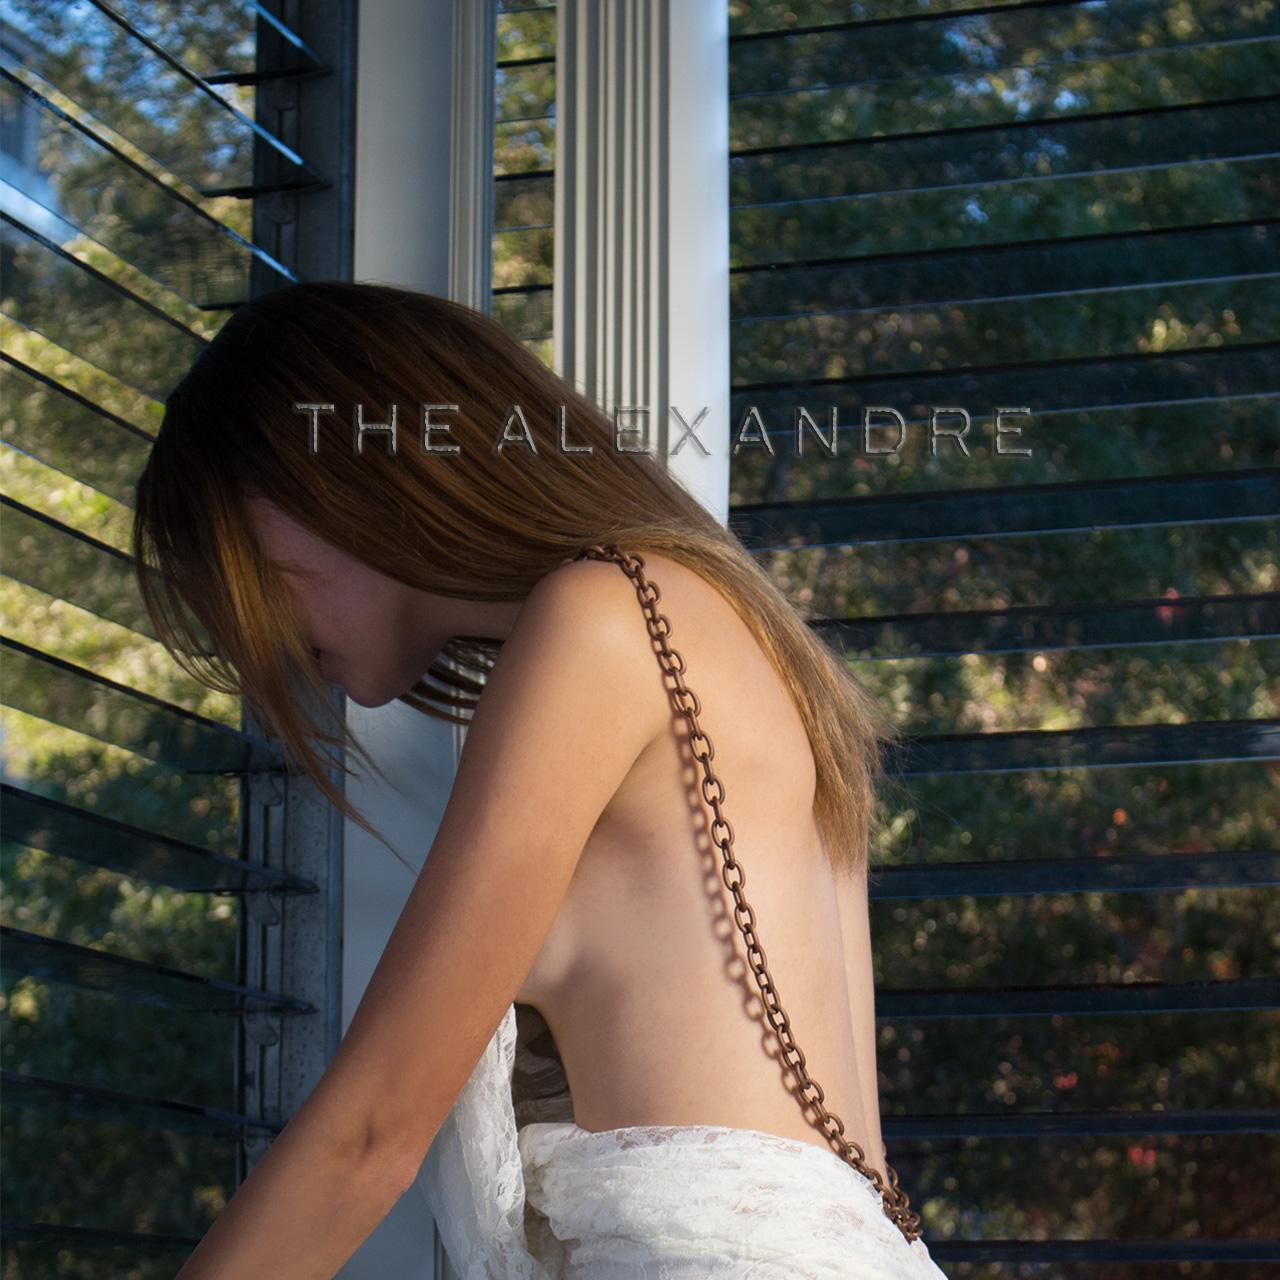 "Alexandre Dorriz,  Spring/Summer 2015 Ready-to-Wear , 2014. Archival Inkjet Print, 42"" x 42"".   www.thealexandre.com"